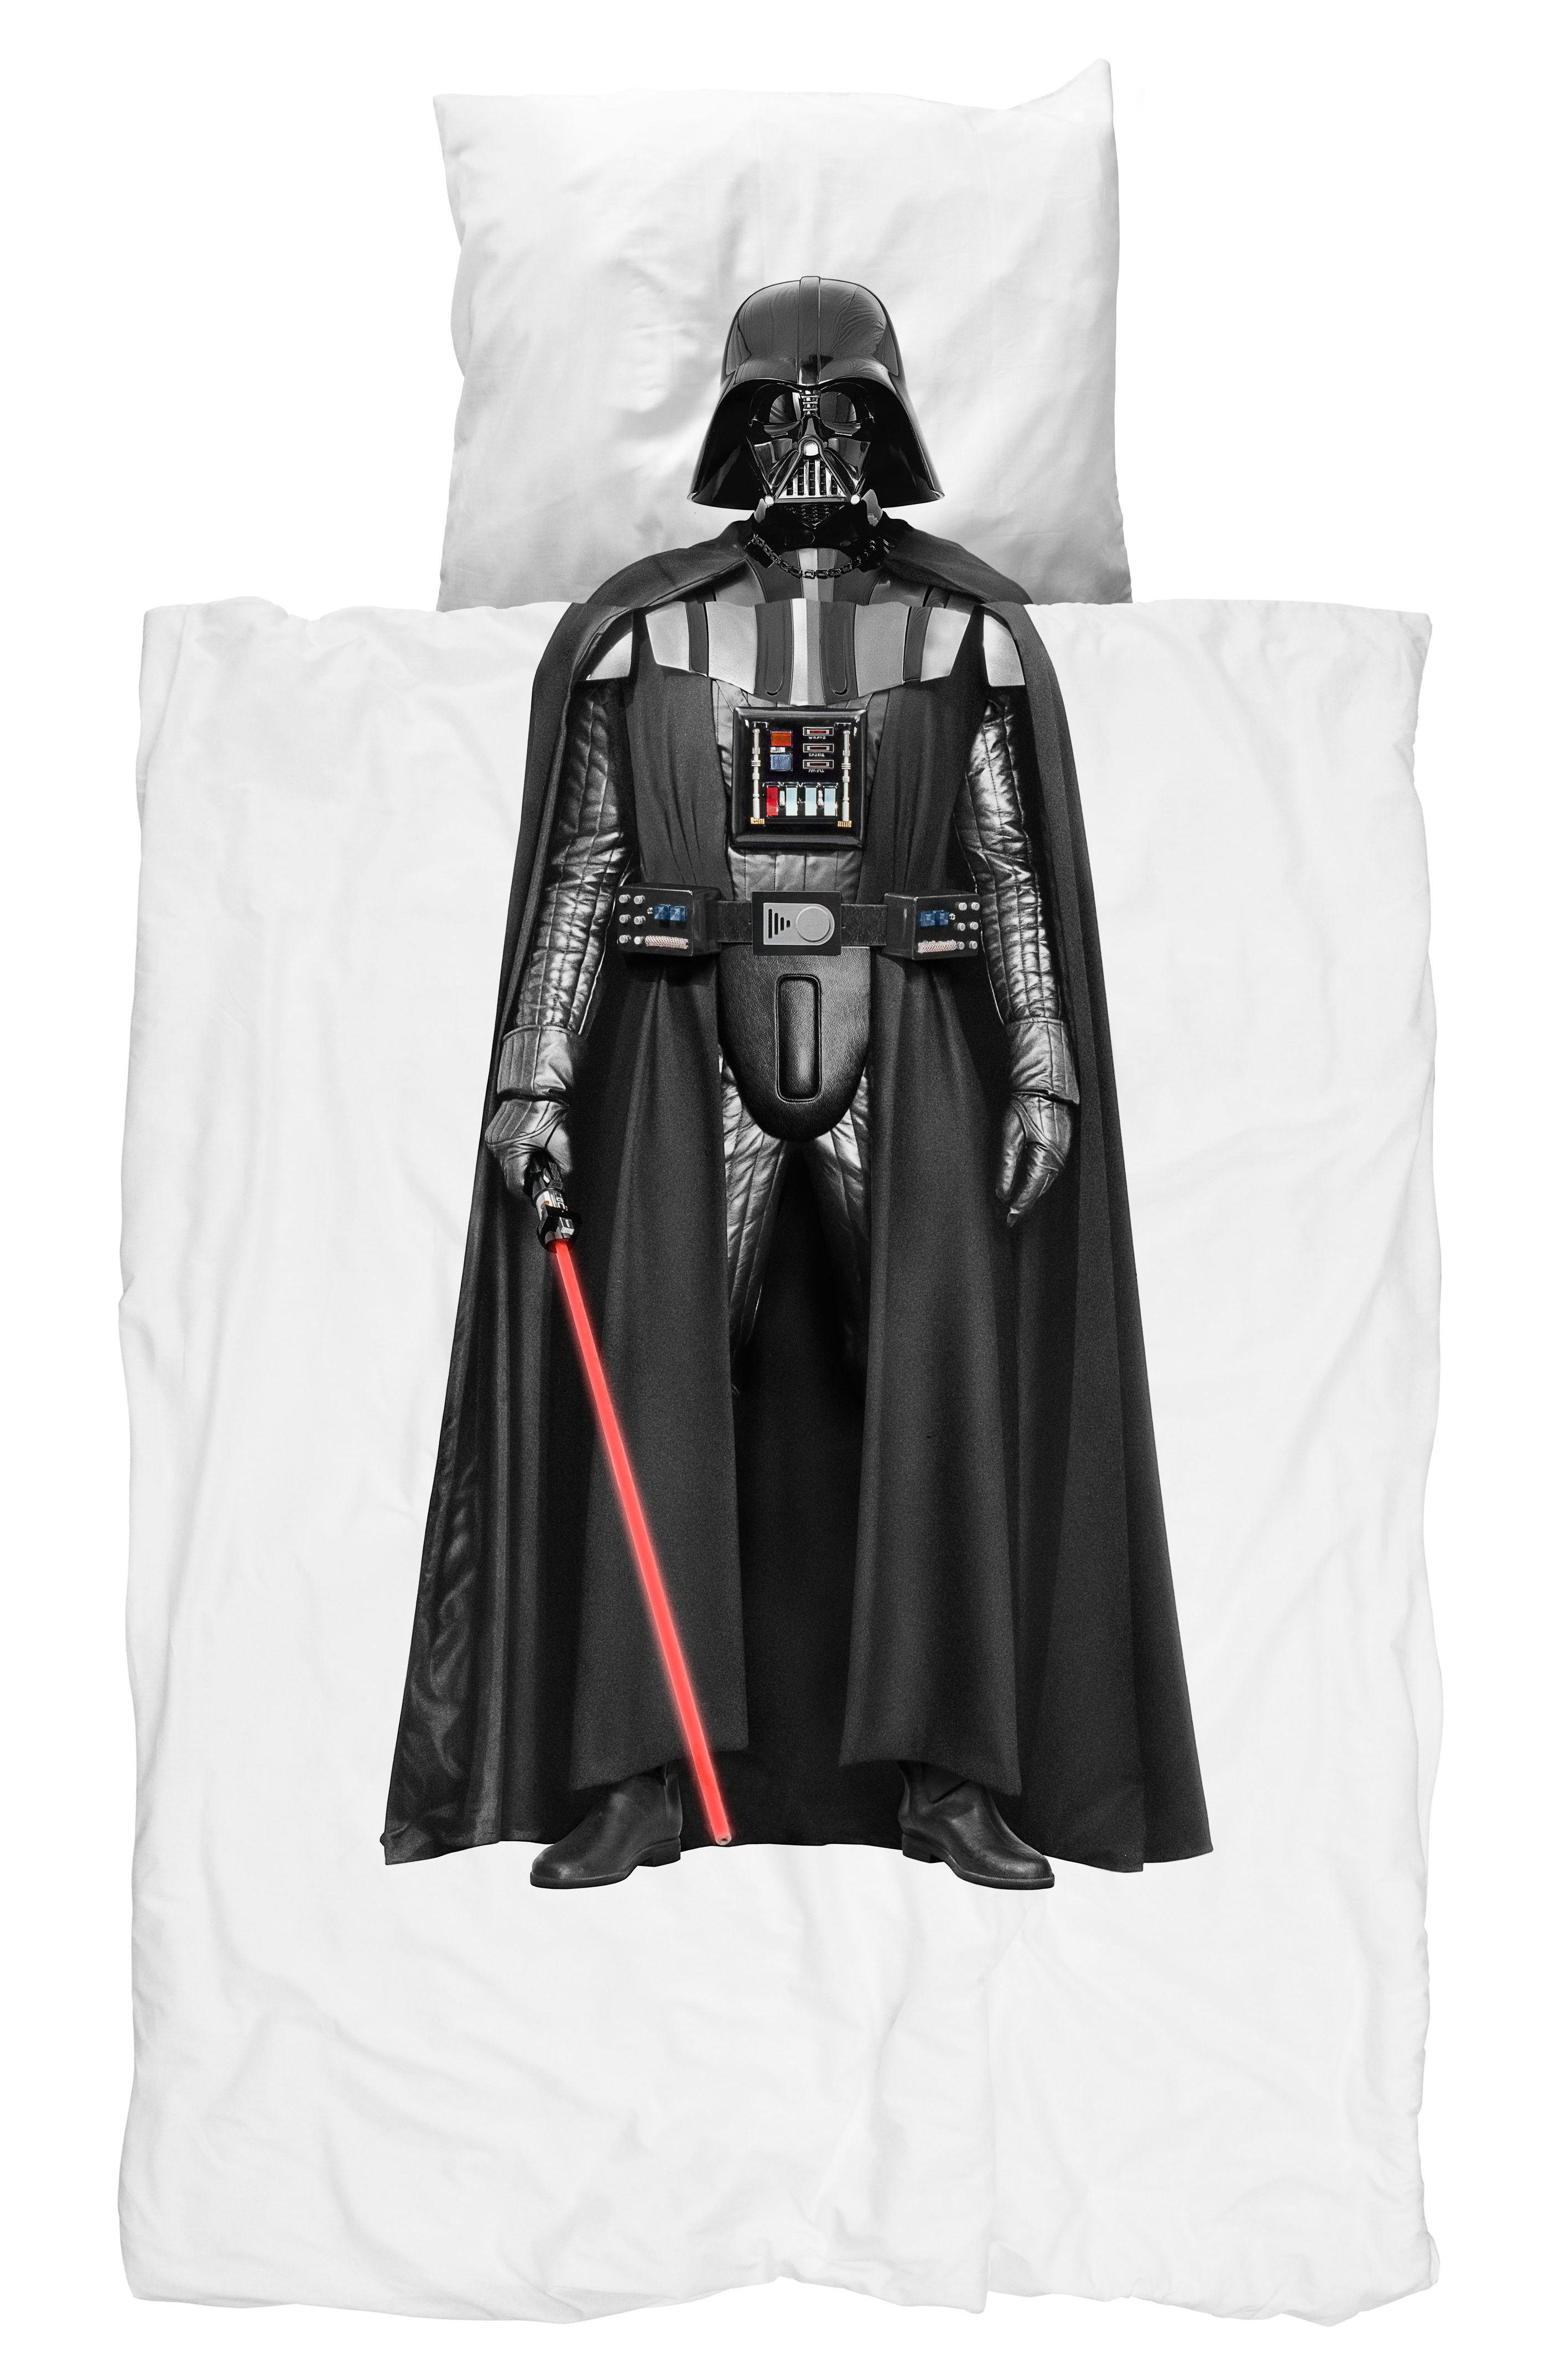 parure de lit 1 personne star wars dark vador 140 x 200 cm edition limit e dark vador snurk. Black Bedroom Furniture Sets. Home Design Ideas